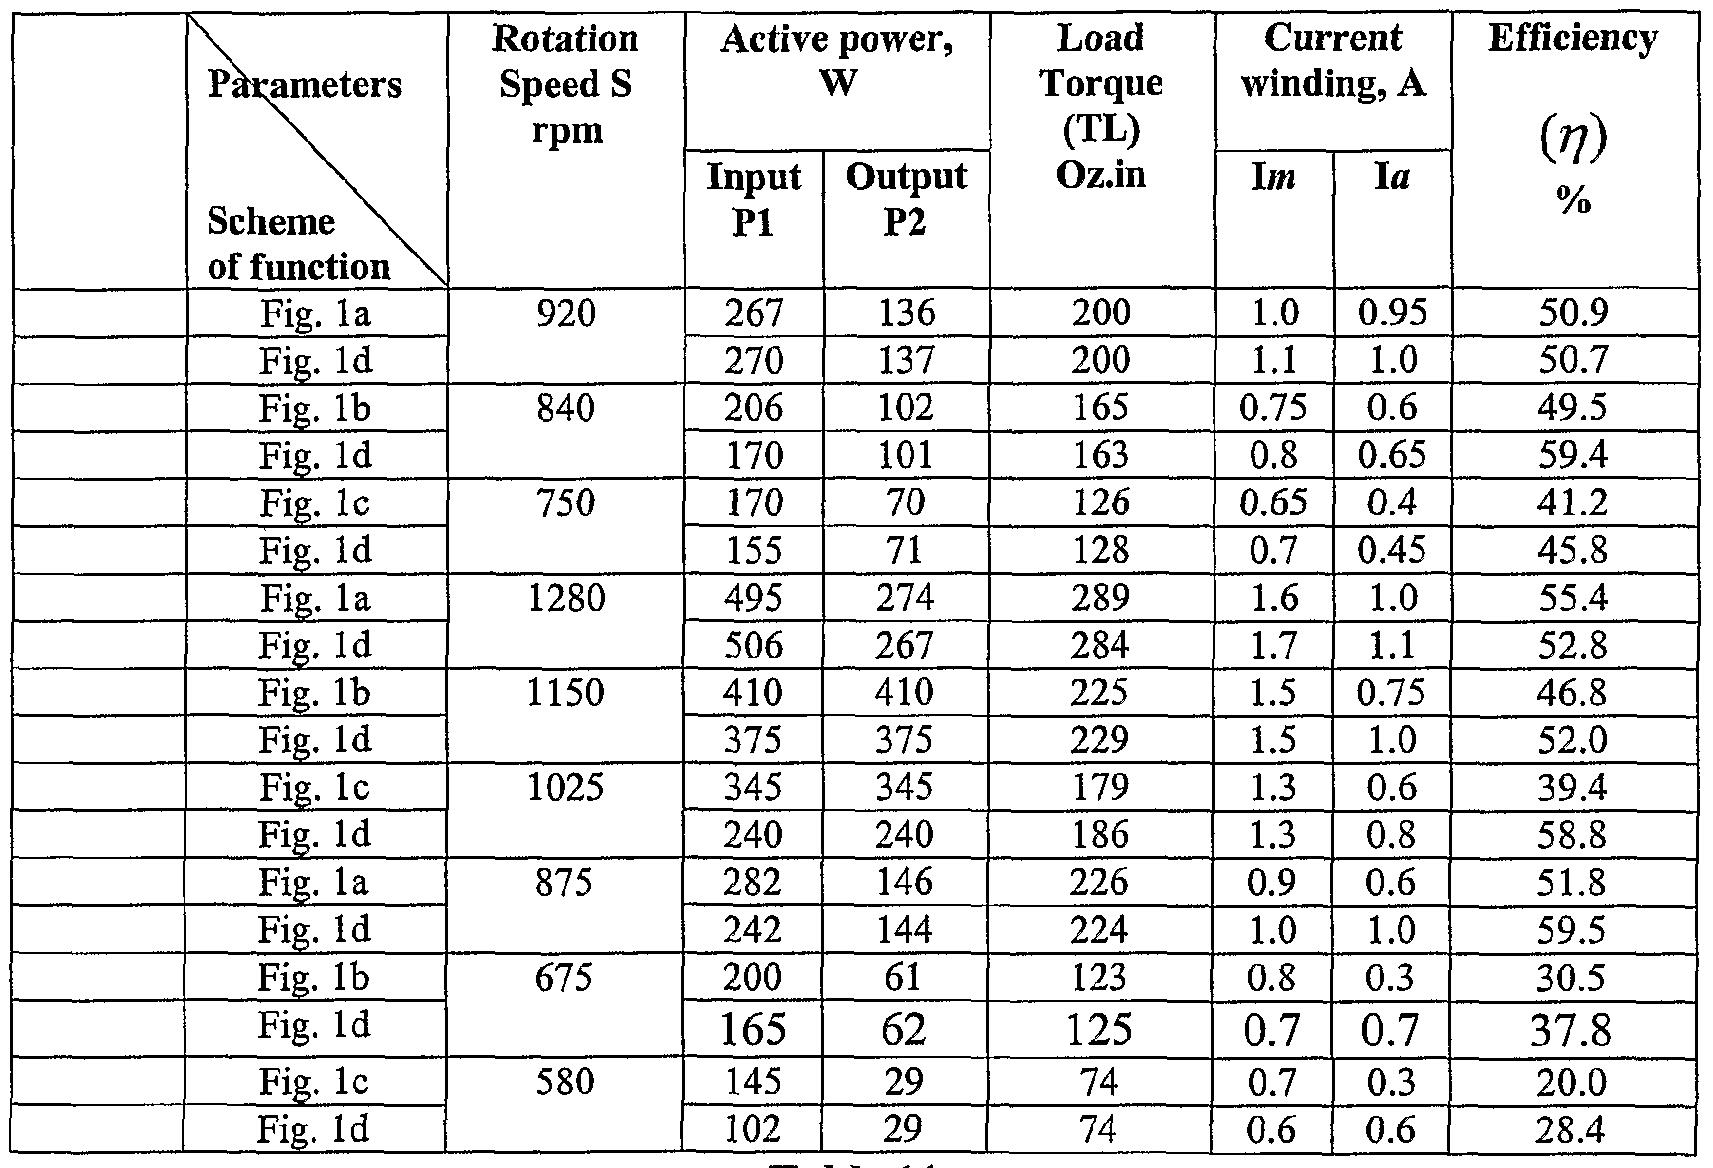 imgf000023_0002?resize\\\\\\\=665%2C453 marathon electric motors wiring diagram & need wiring diagram for baldor motors wiring diagram at fashall.co